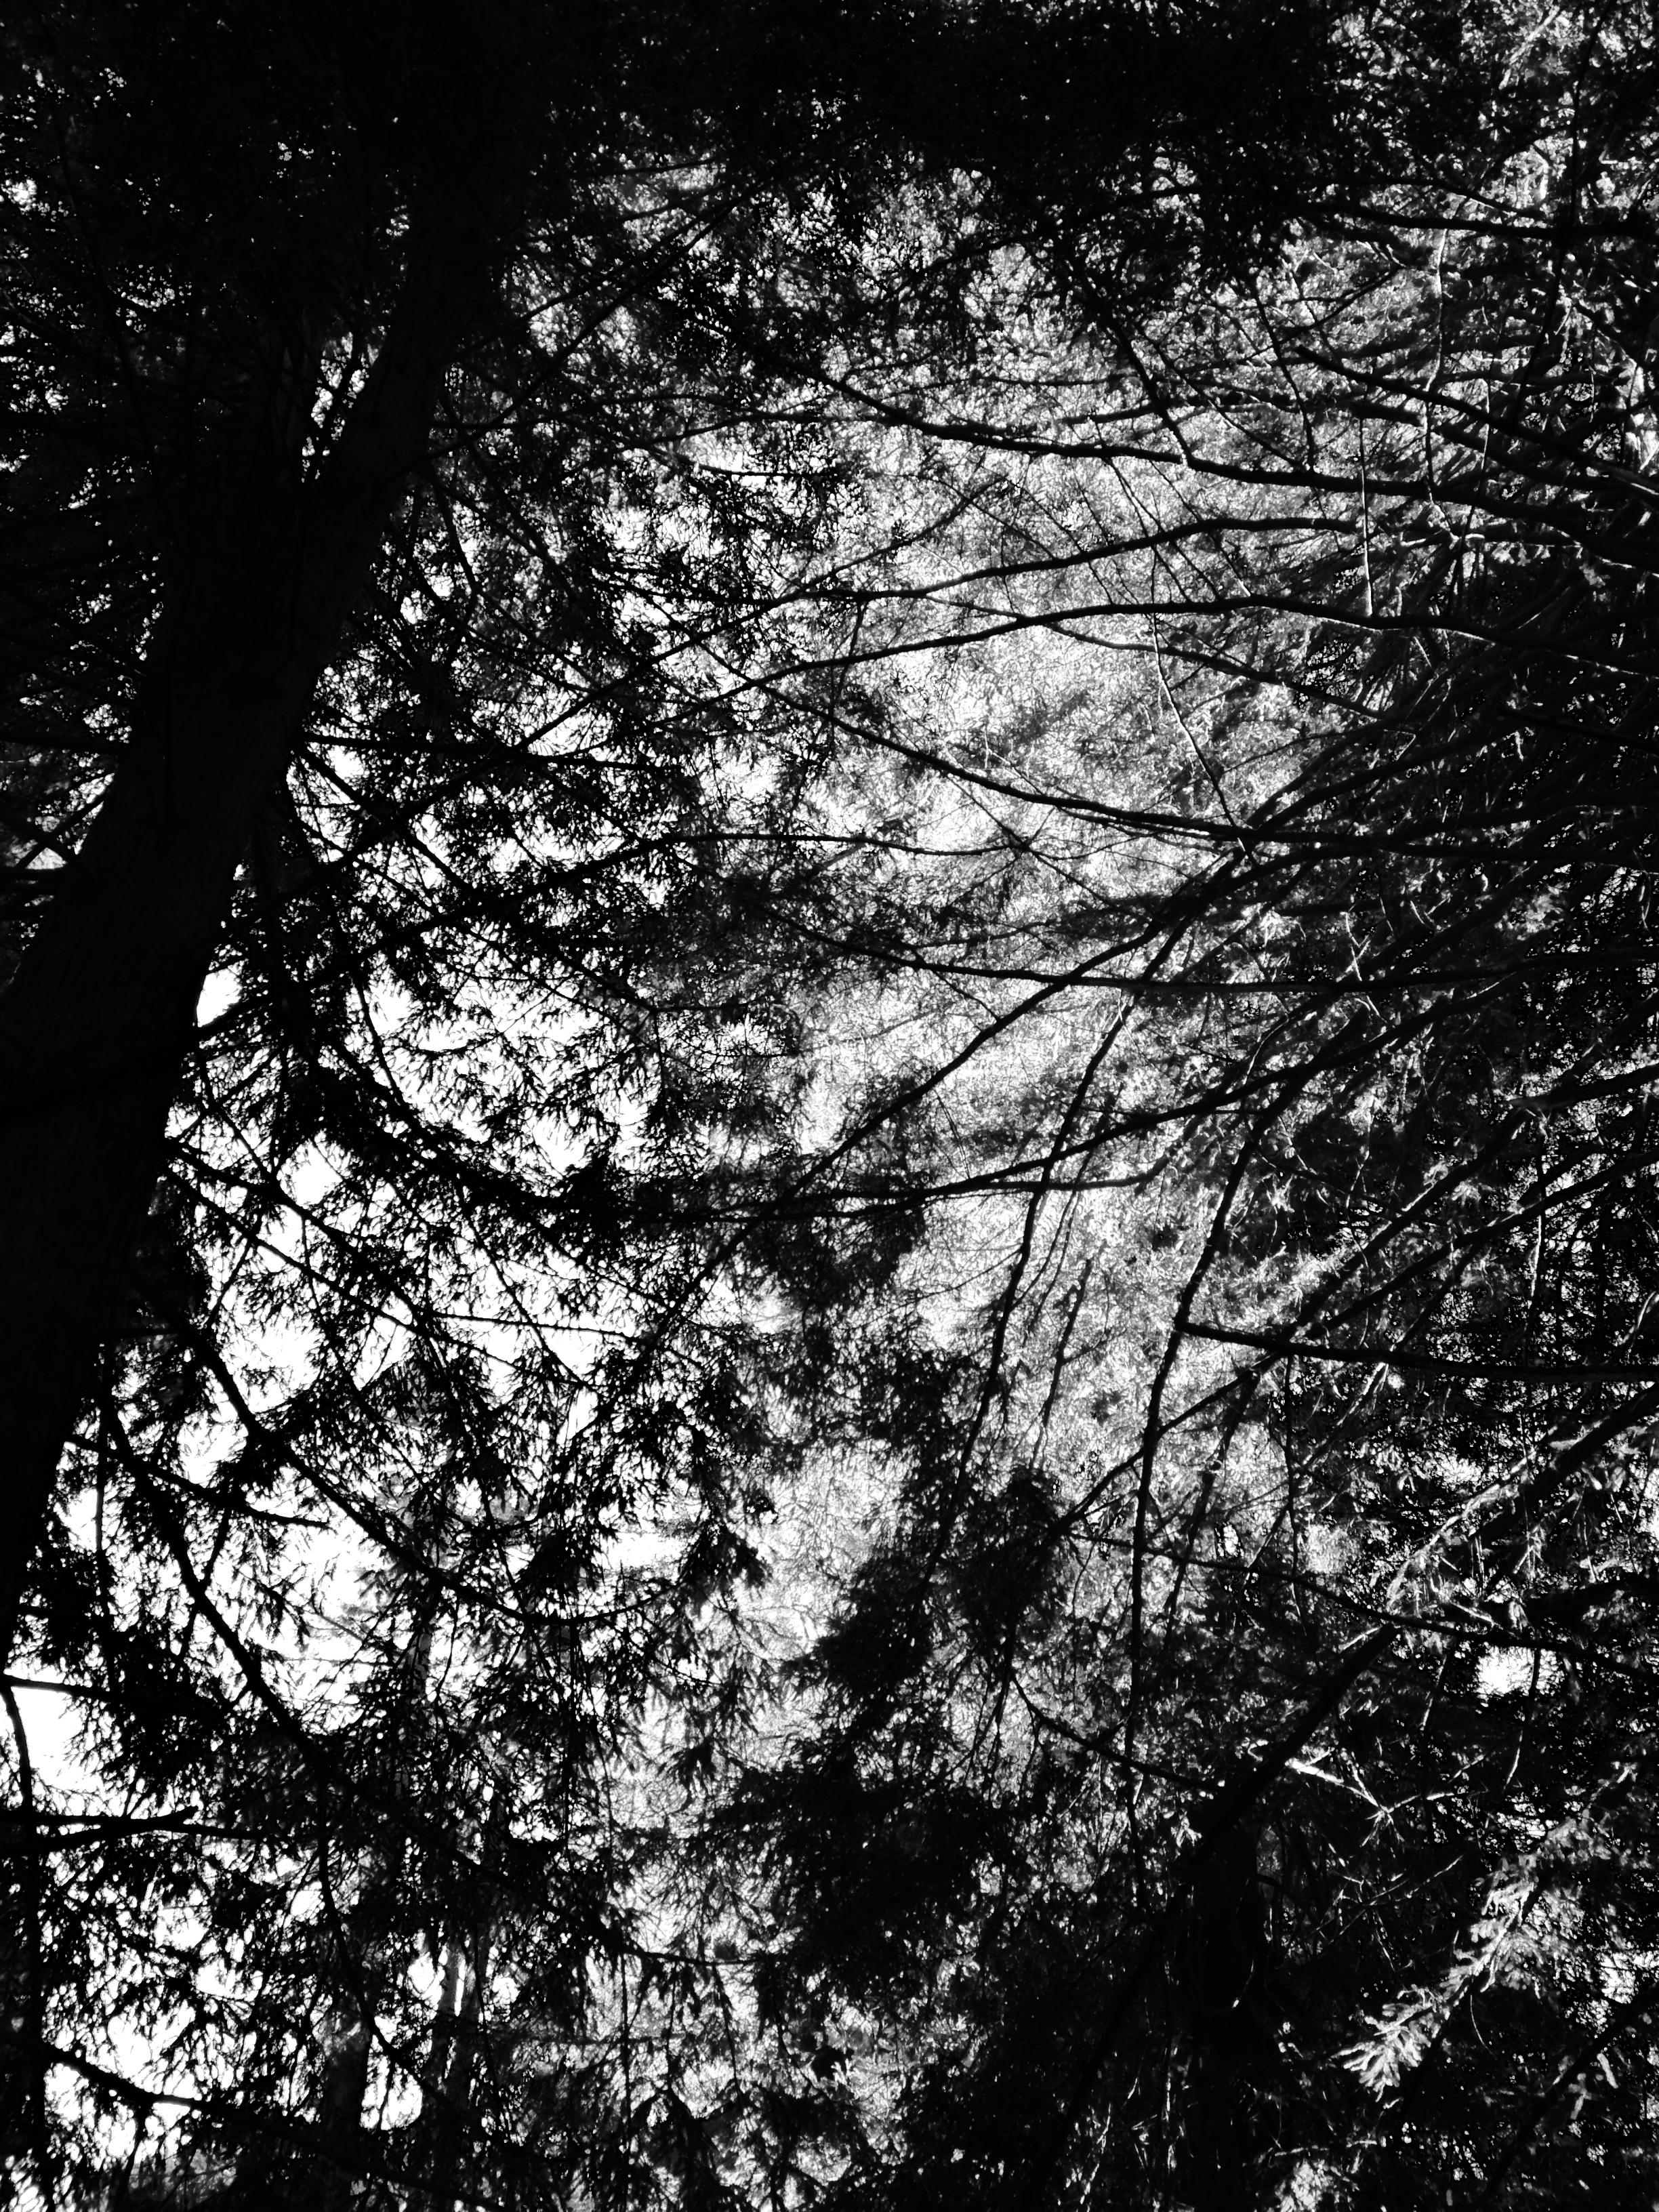 Redwood canopy San Francisco Botanical Garden, January 15, 2017.